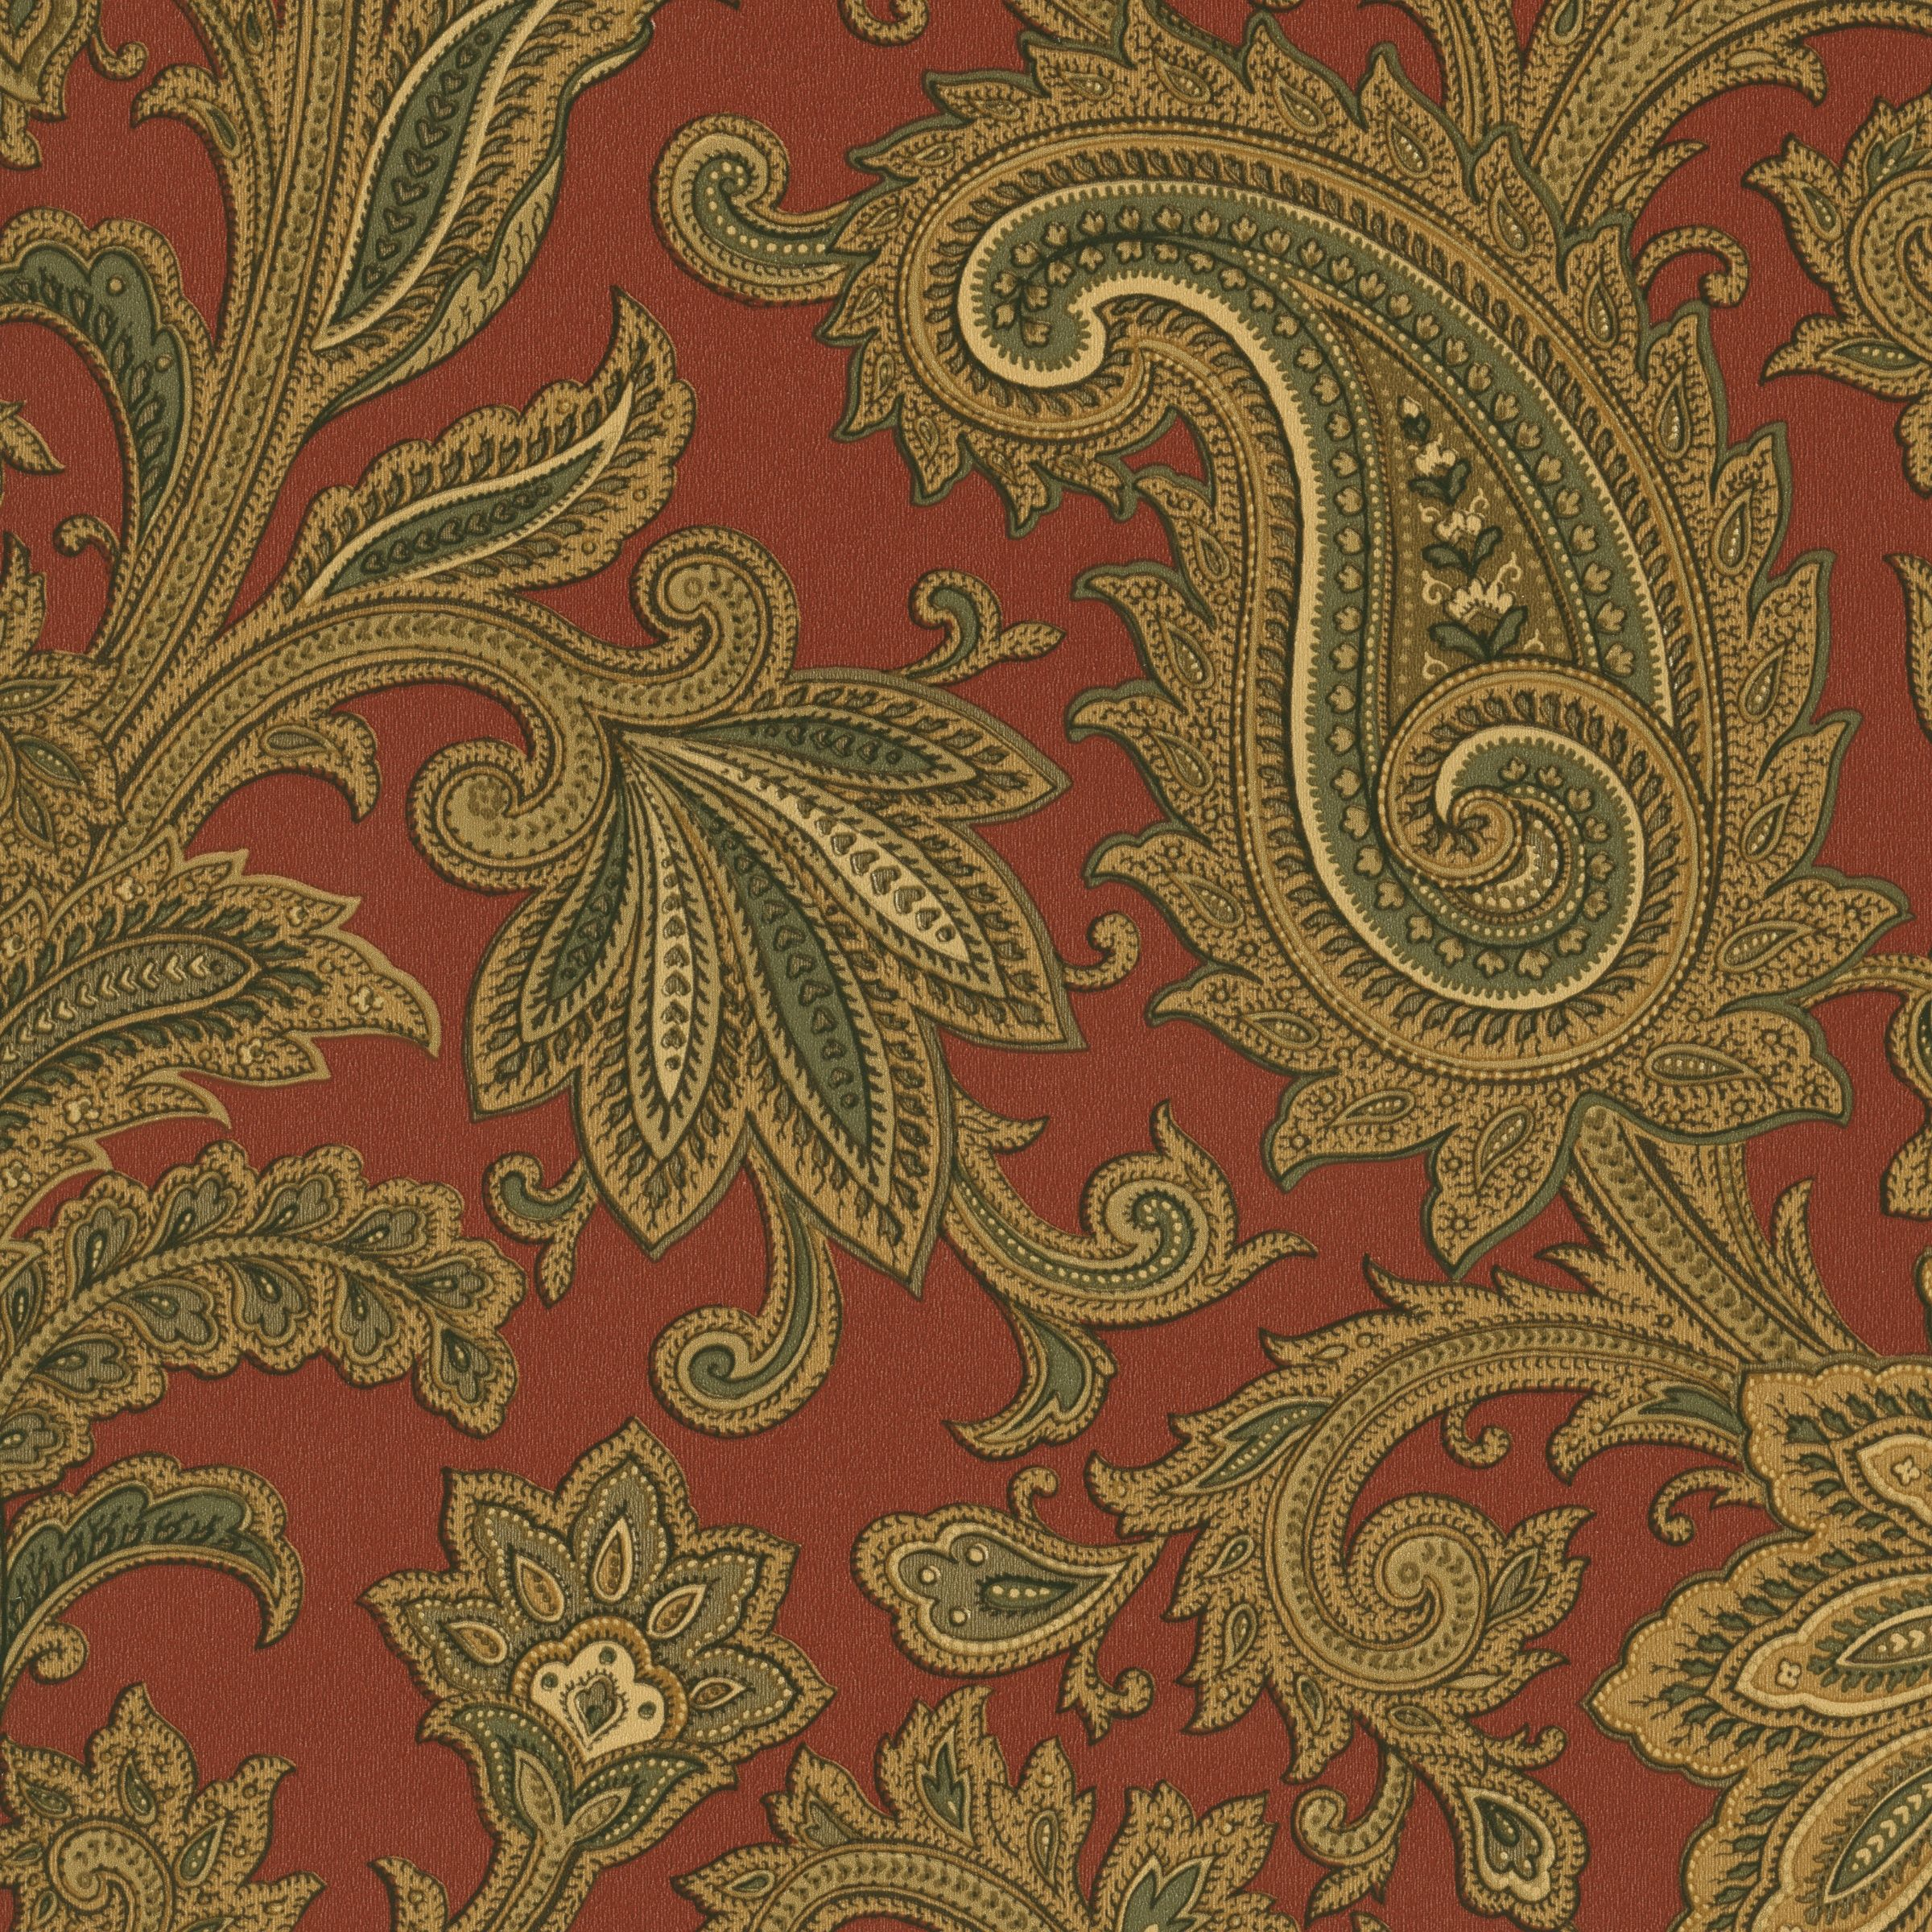 Rusty red, khaki, olive green & cream paisley wallpaper